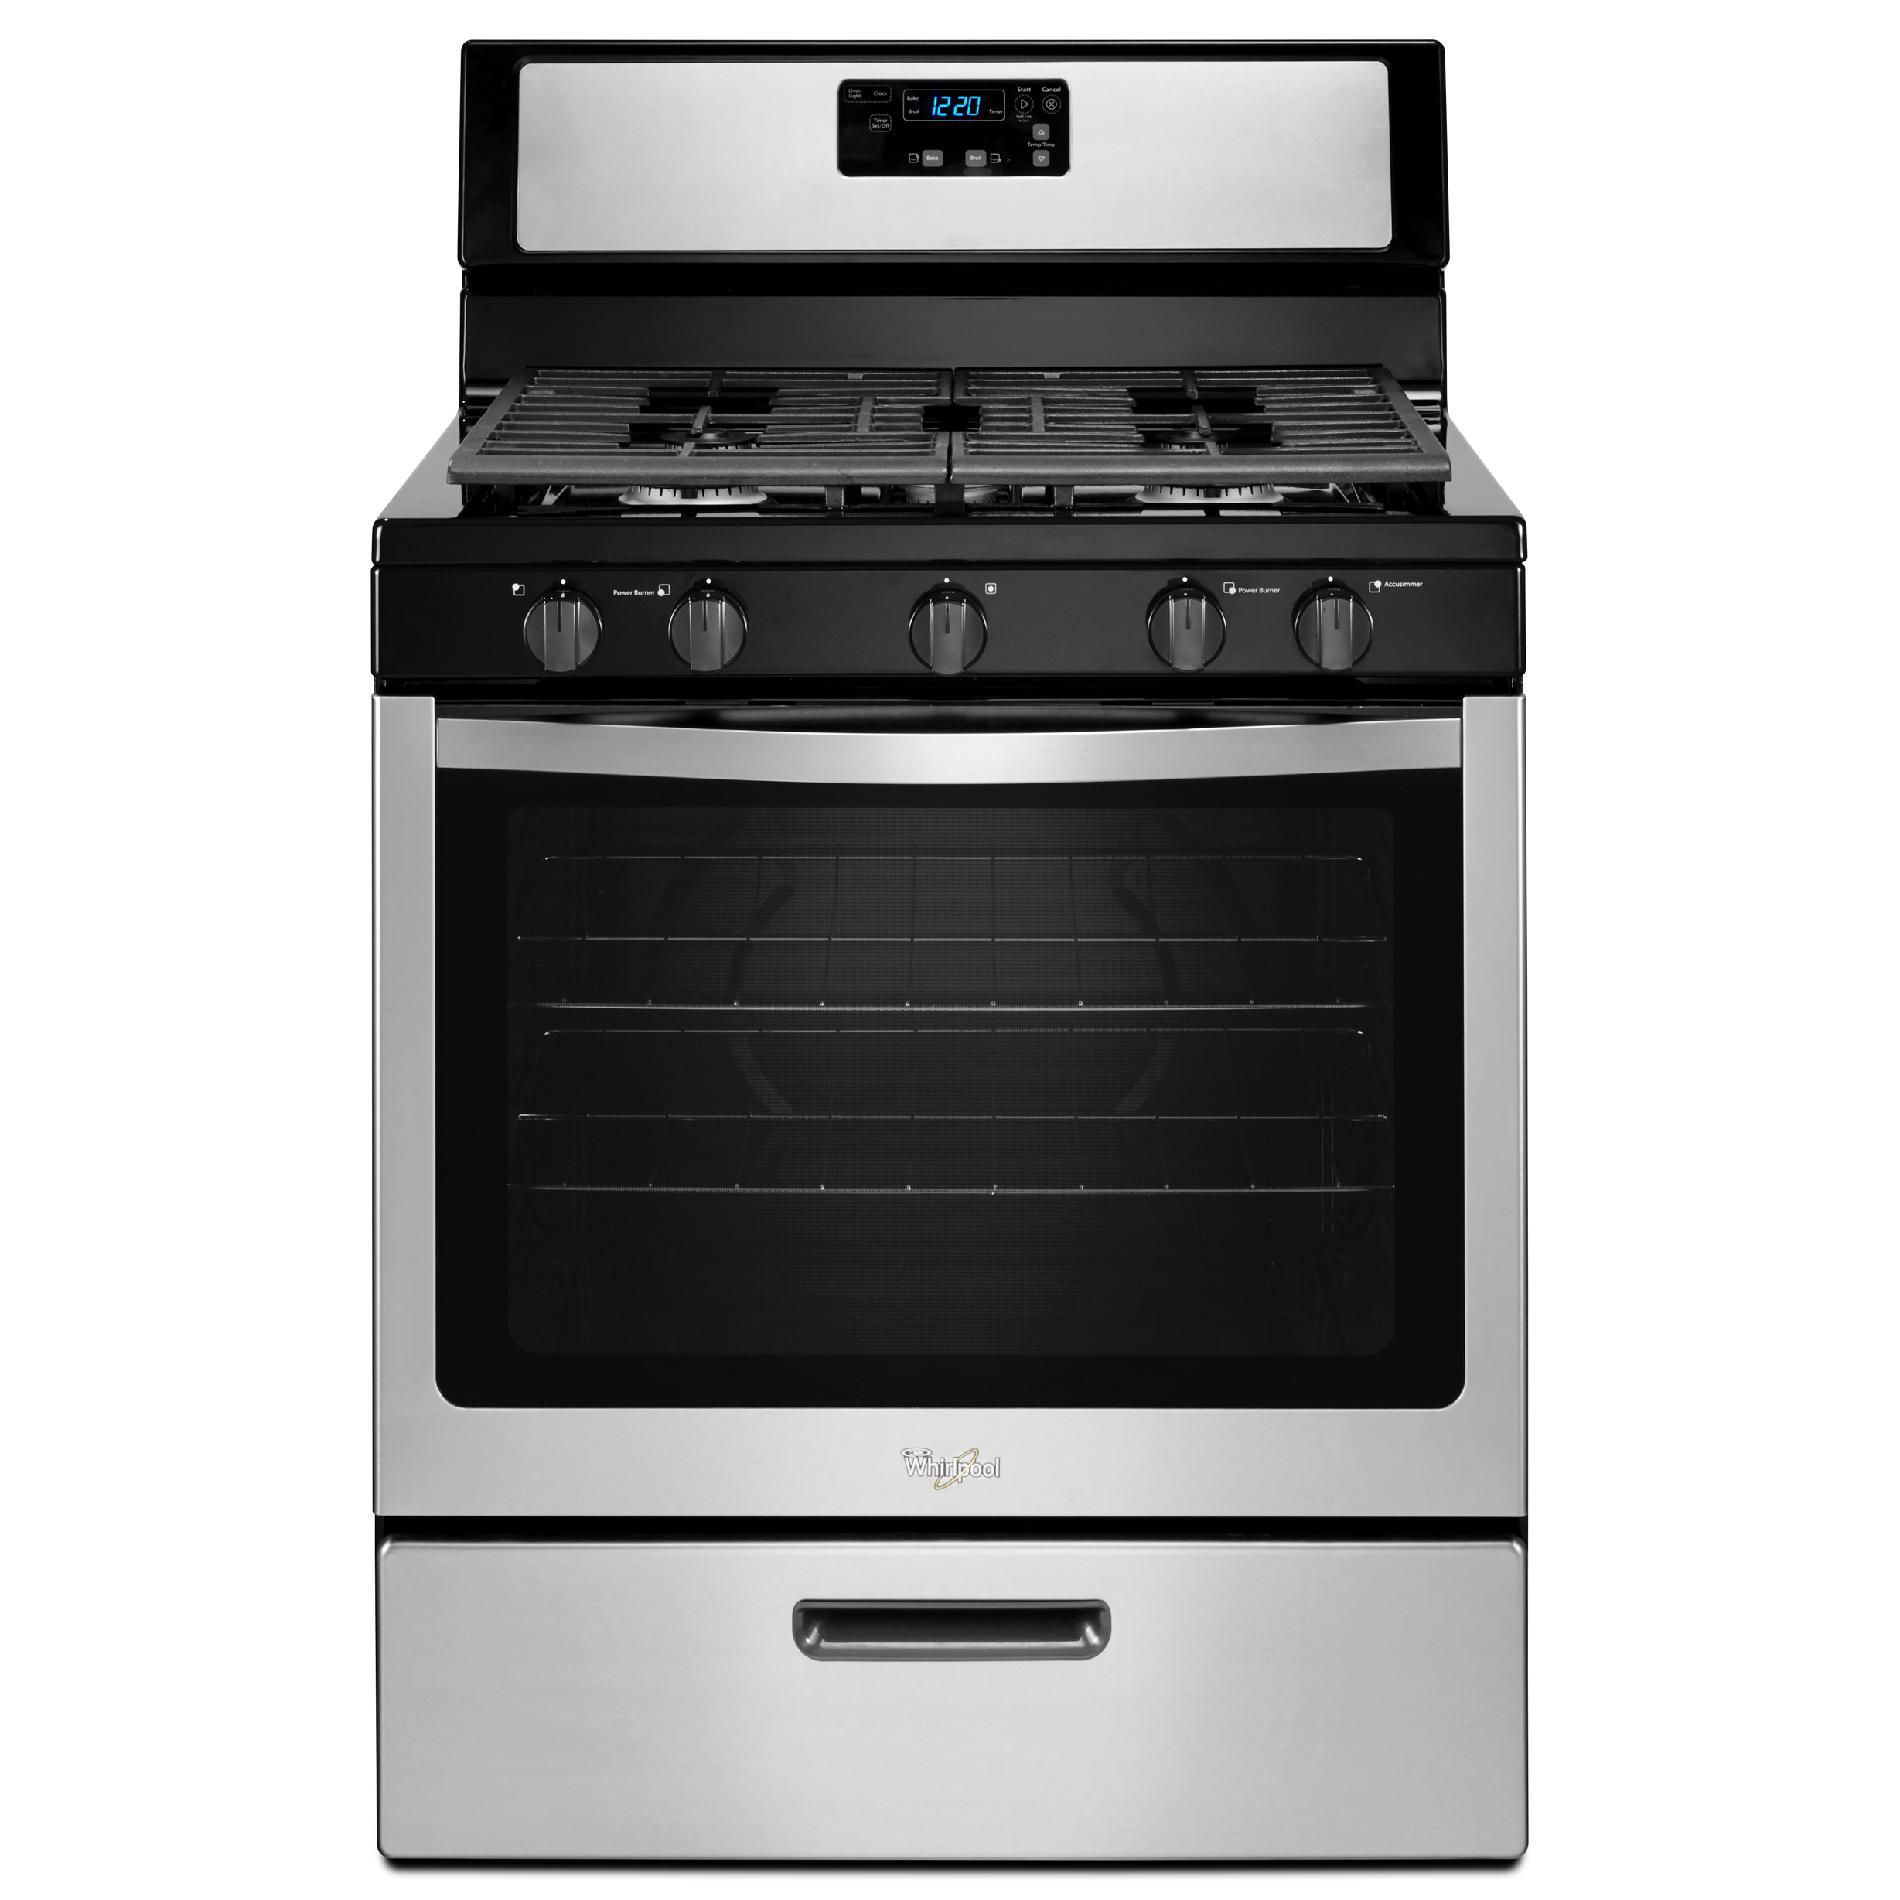 electric stove ez go mpt 1000 48 volt wiring diagram sears ranges home decor